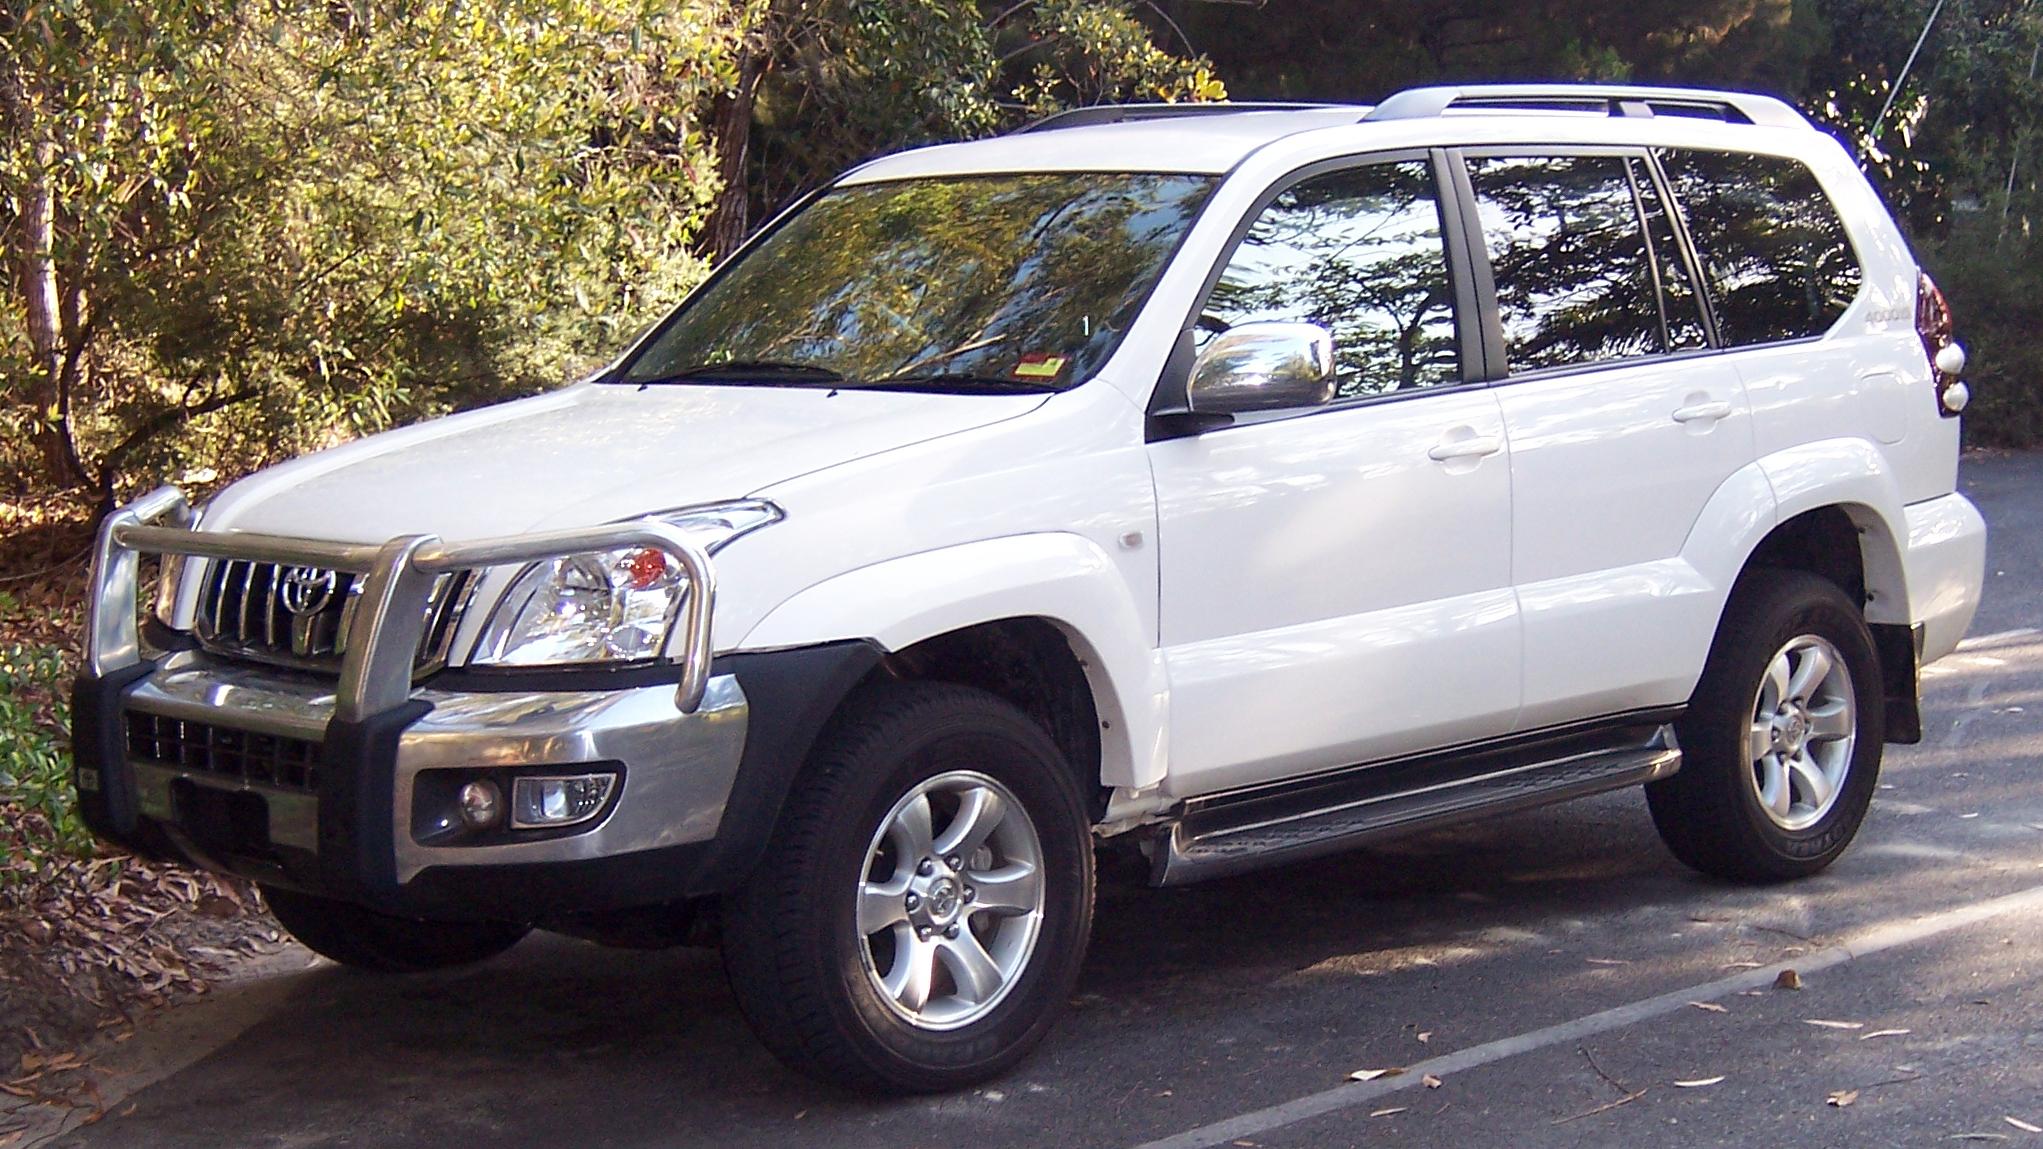 Toyota Land Cruiser Wiki >> File:2003-2007 Toyota Land Cruiser Prado (GRJ120R) 01.jpg - Wikimedia Commons